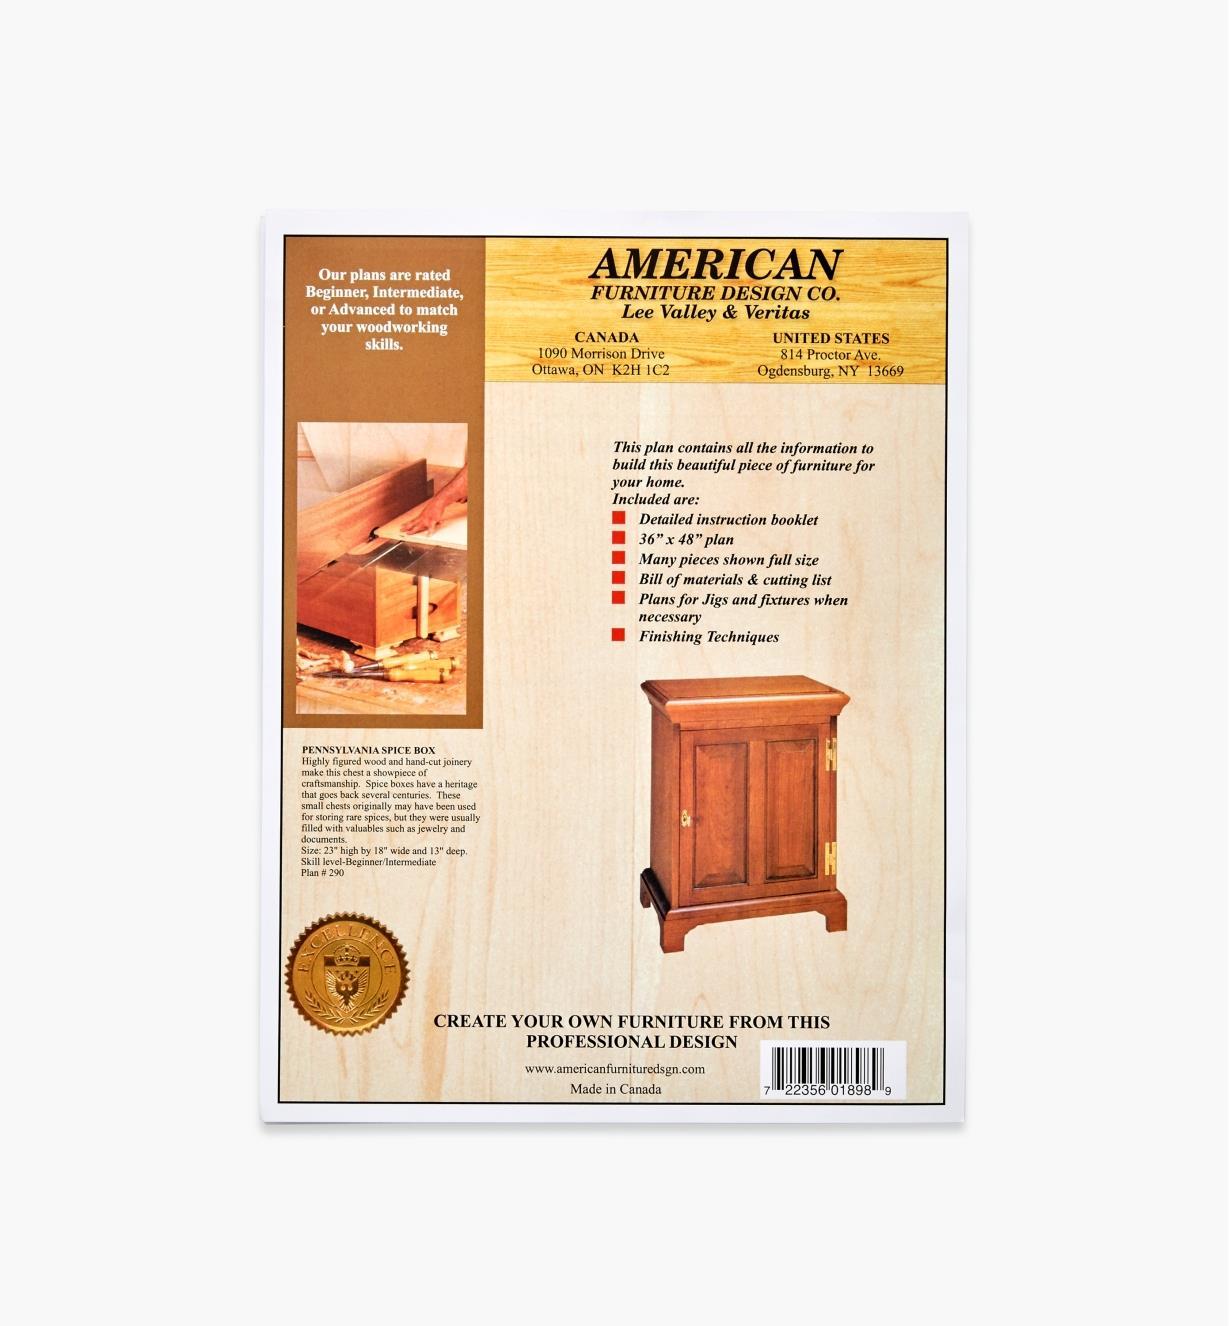 Pennsylvania Spice Box Plans